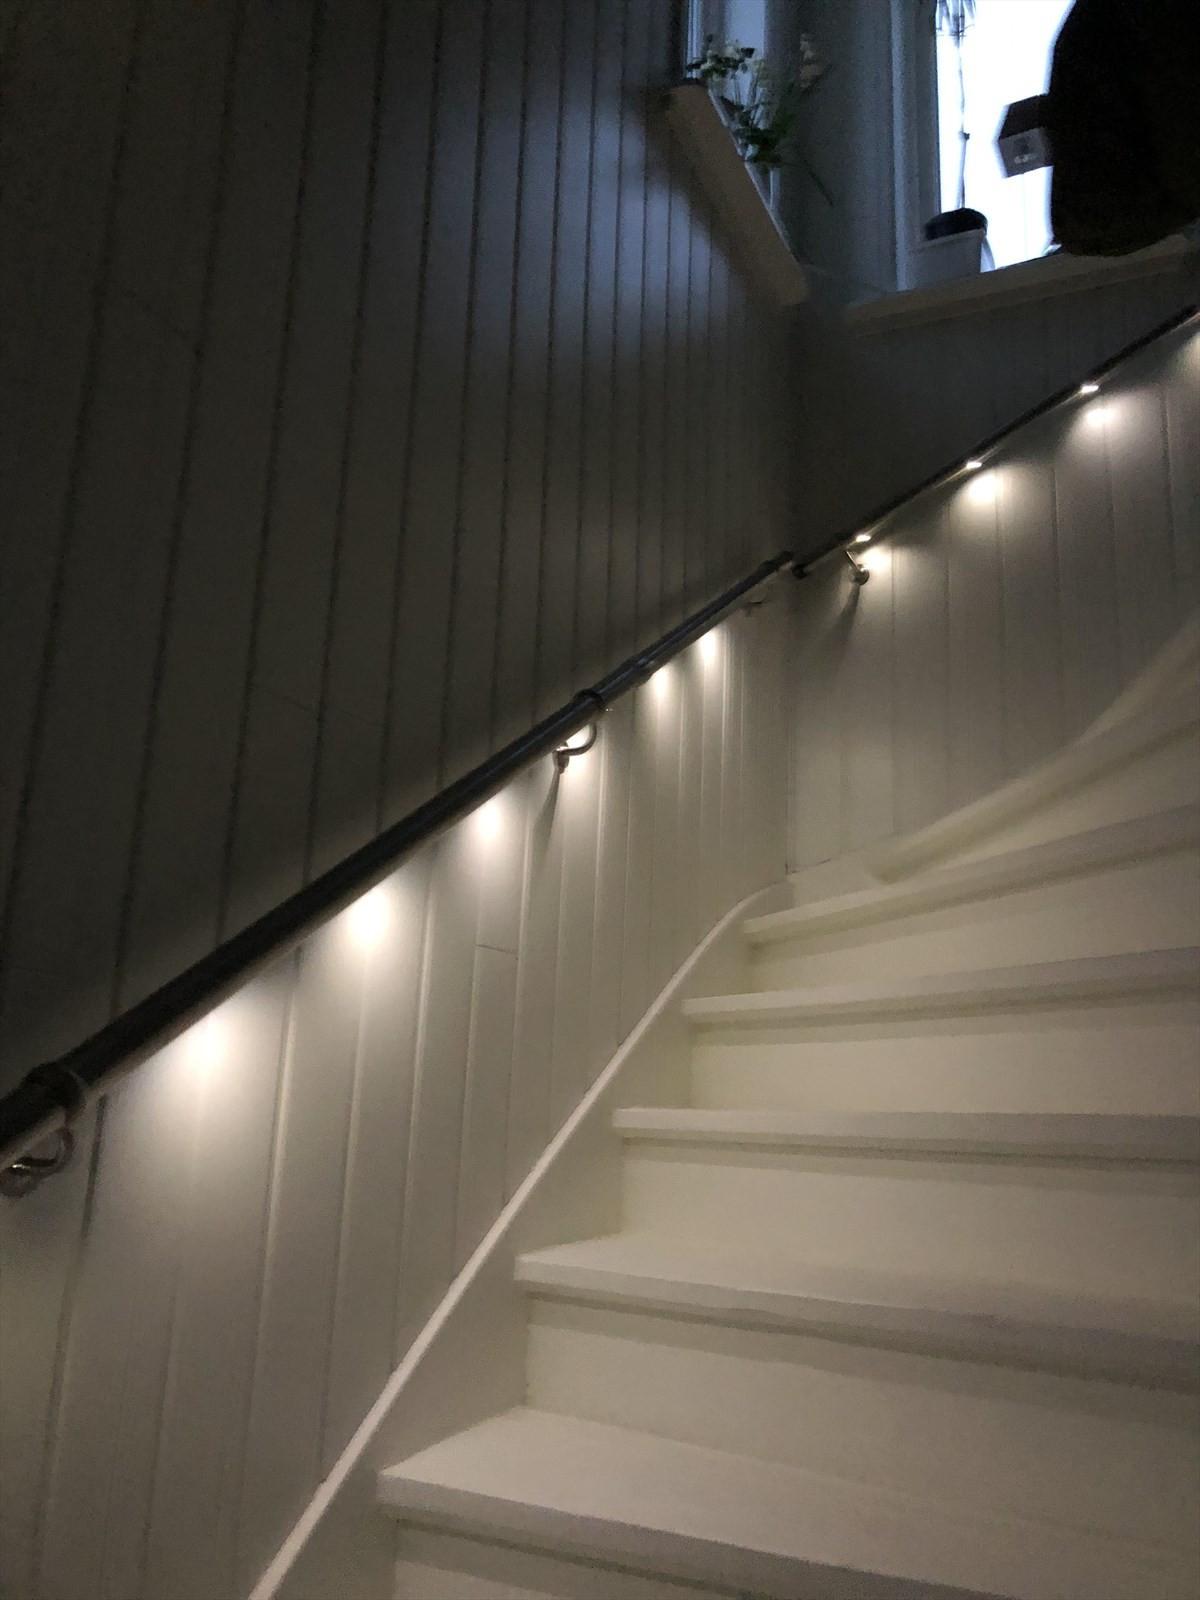 Fresh belysning i trappen mellom etasjene.